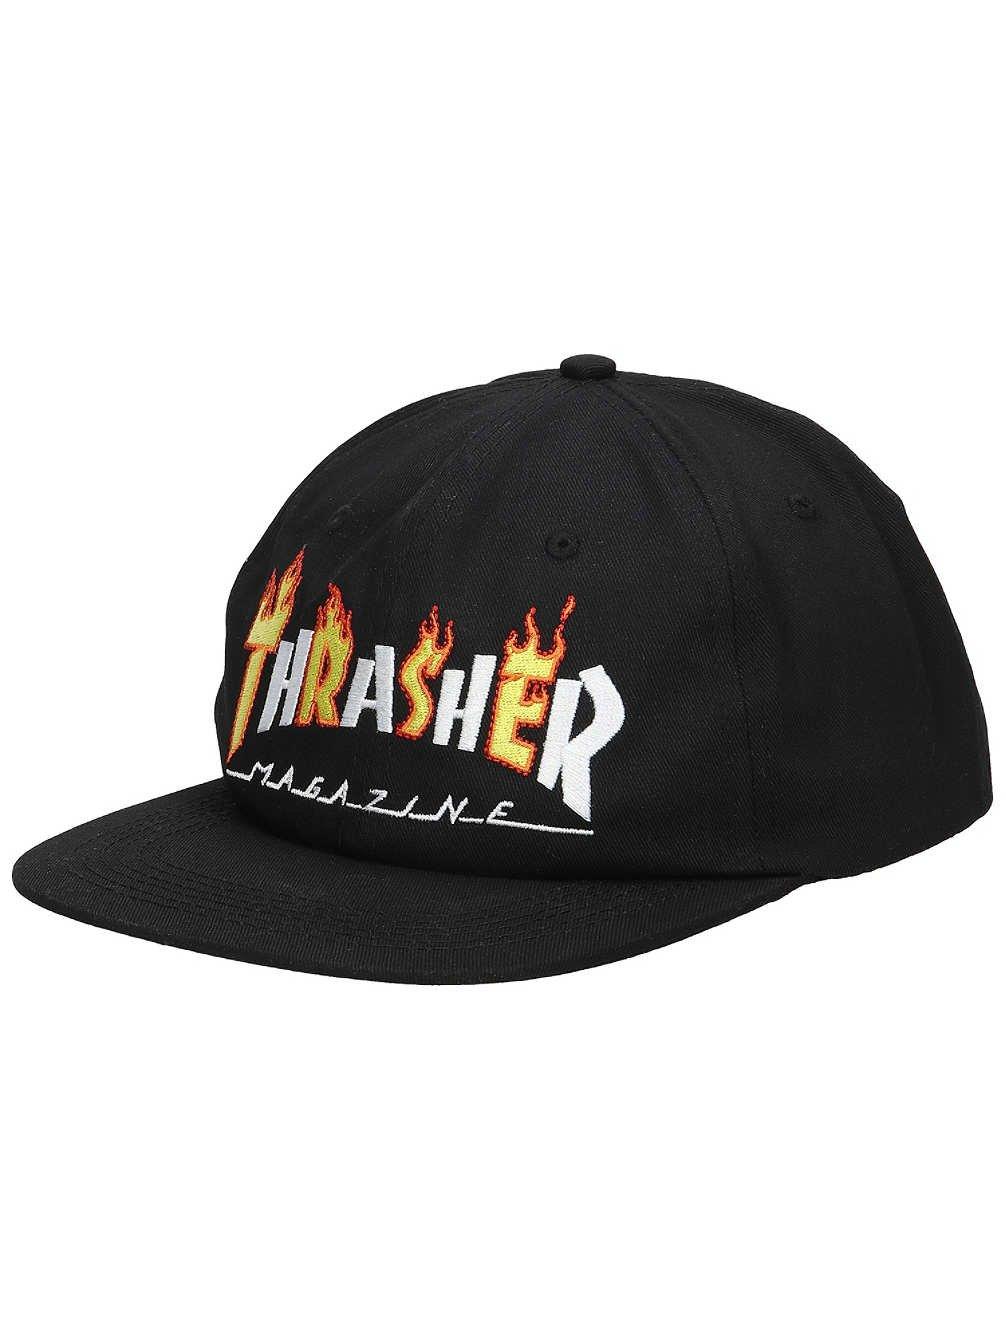 ac55b1afe67 Amazon.com   Thrasher Flame Mag Snapback Hat Black   Sports   Outdoors